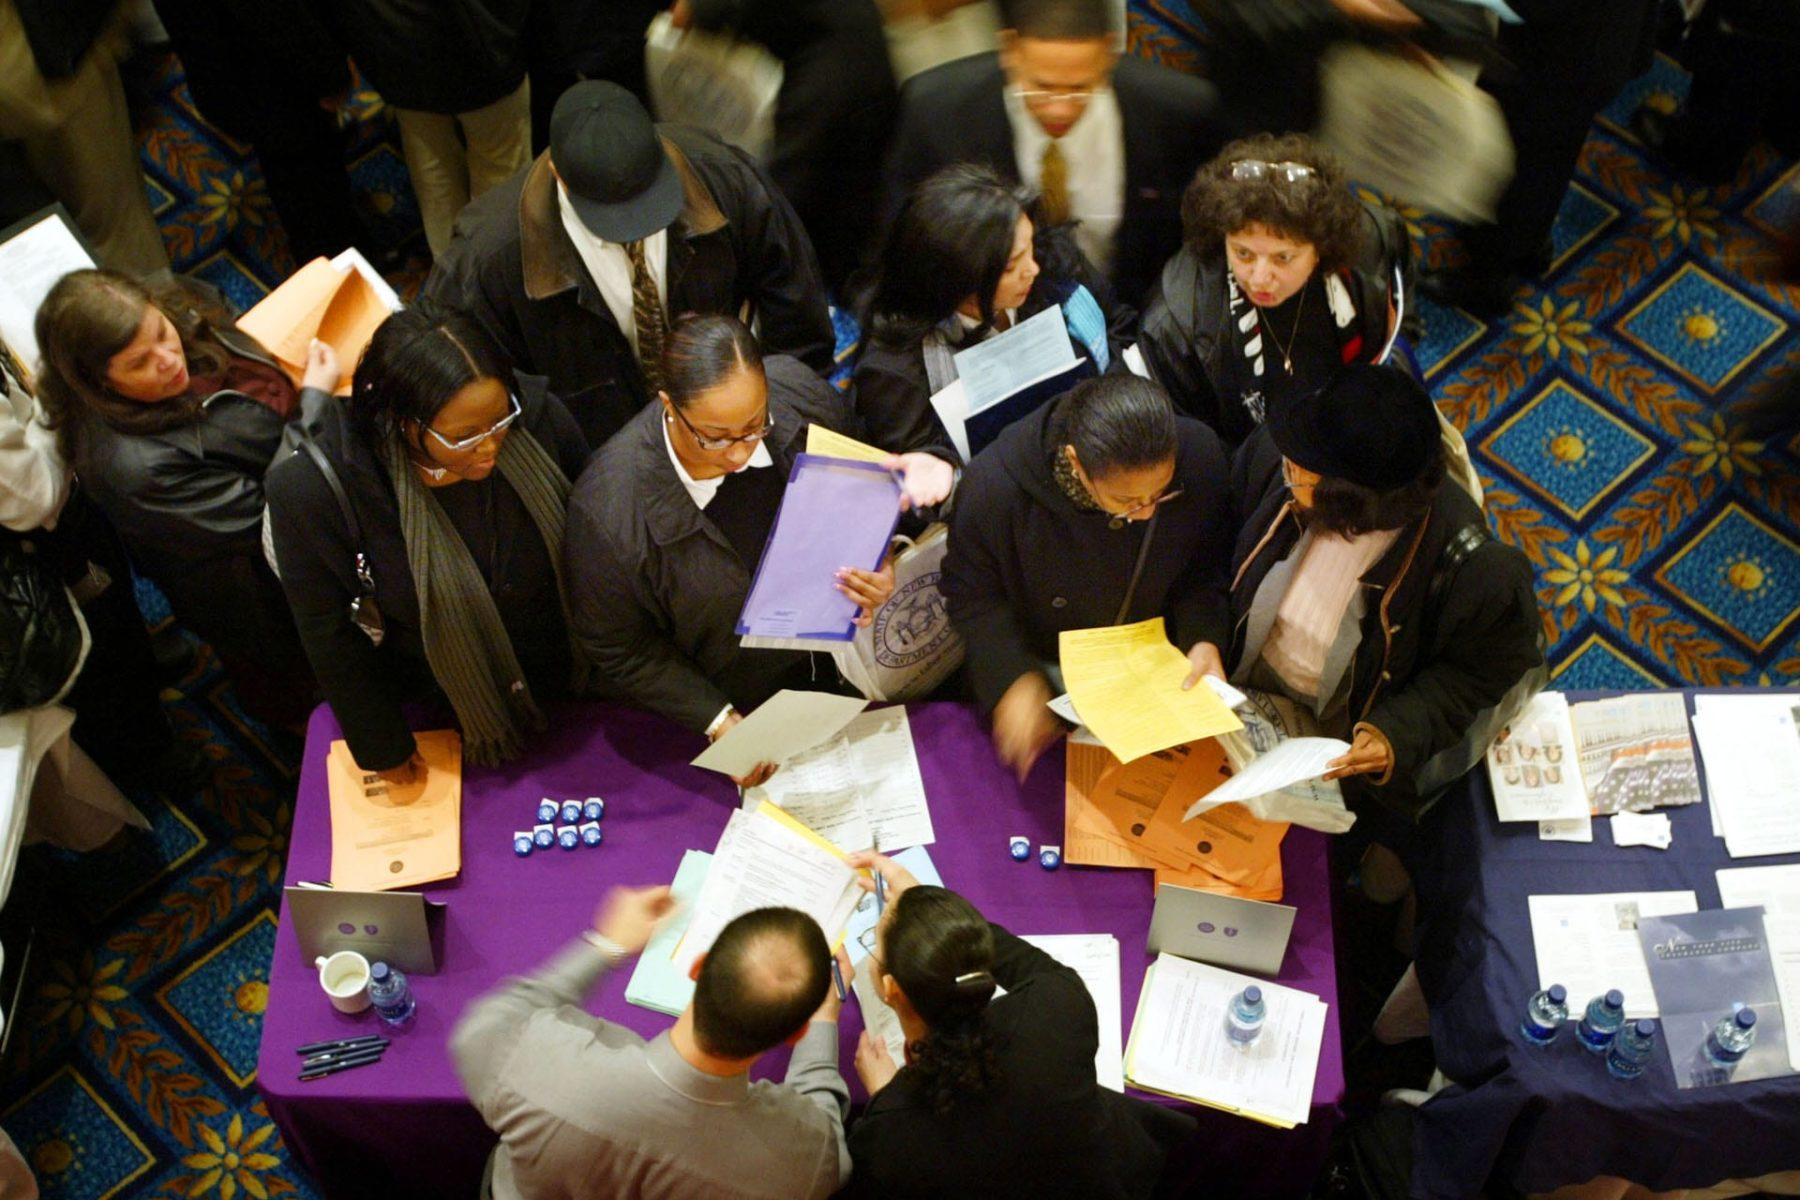 Job applicants gather around an employers table at Hispanic job fair.